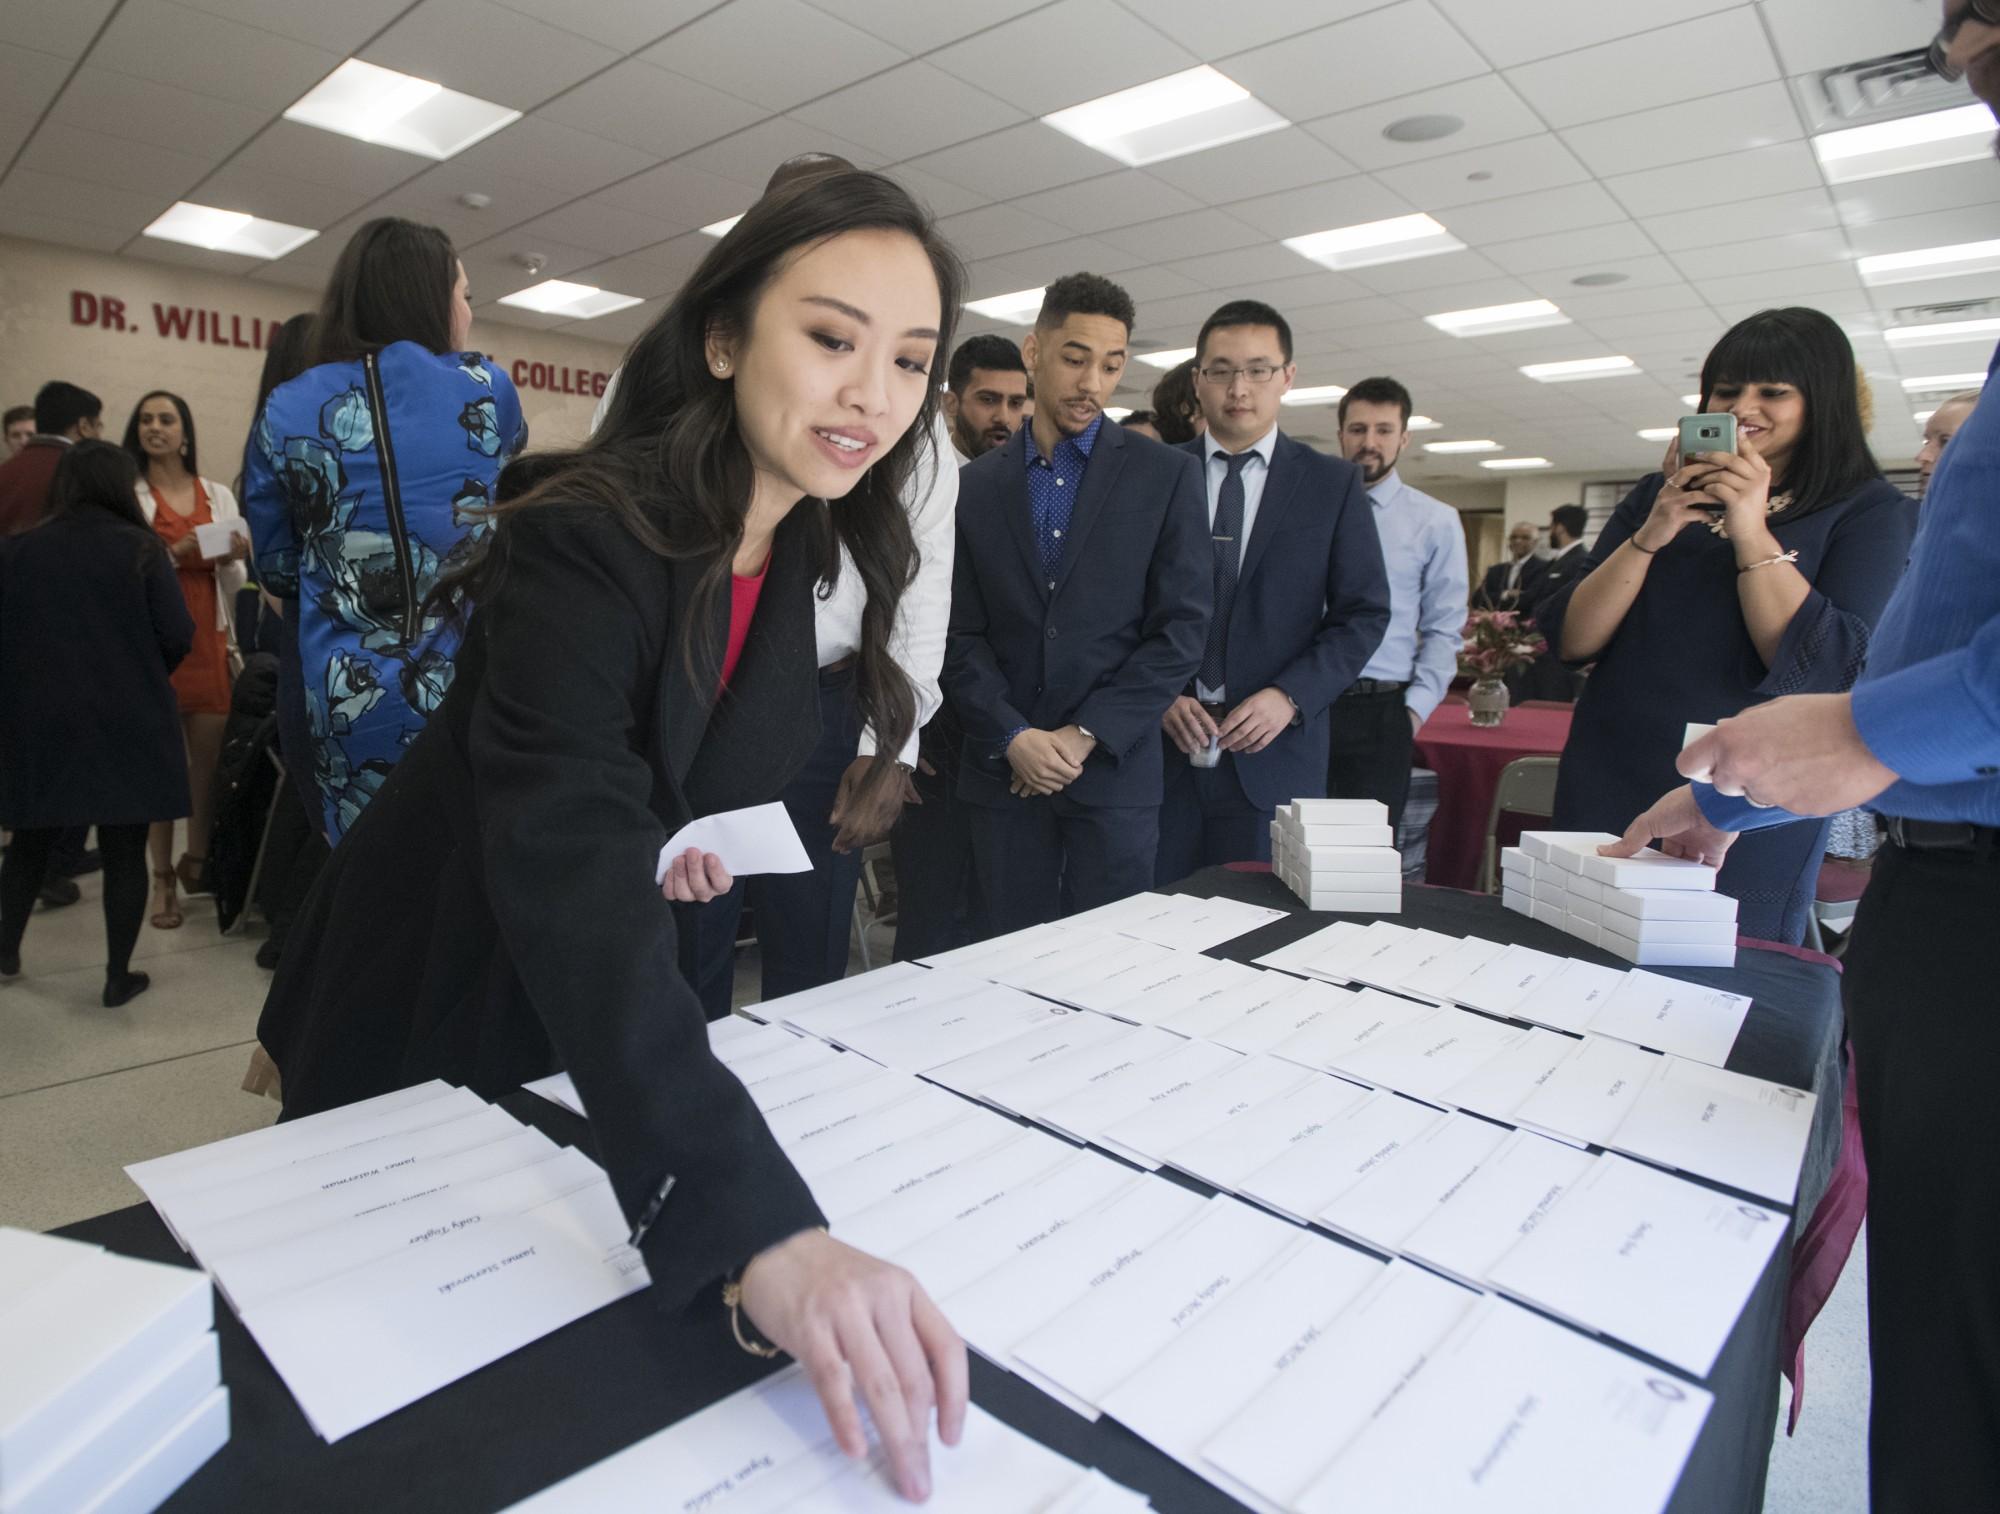 Scholl College Class of 2018 Achieves 100 Percent Match Rate